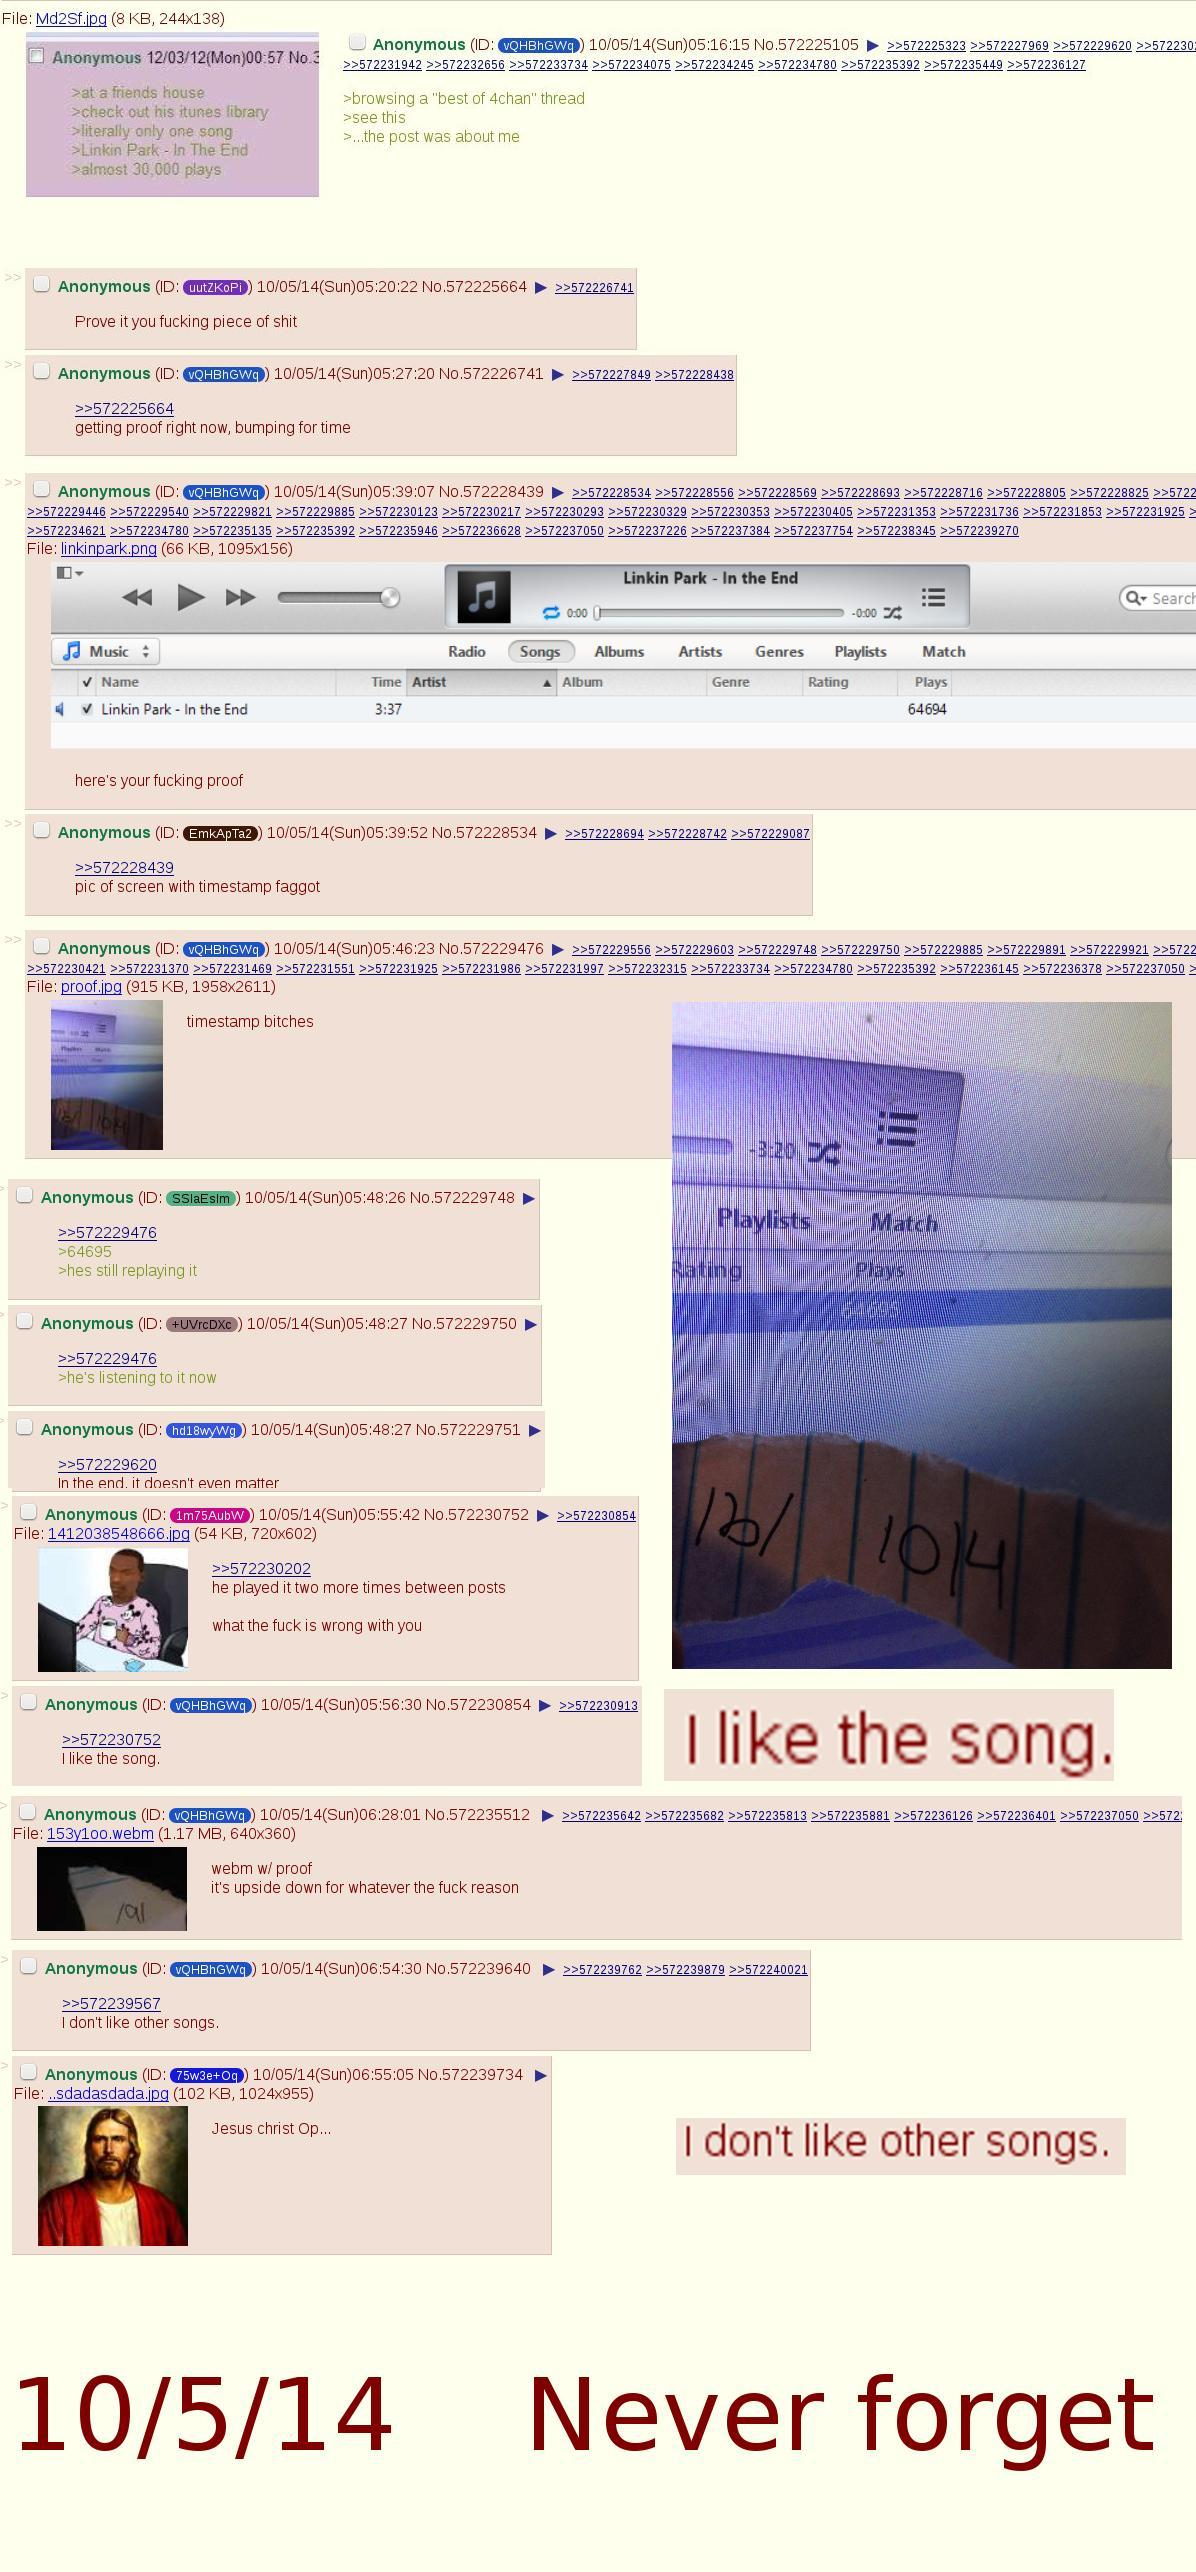 Linkin Park Man Returns | 4chan | Know Your Meme